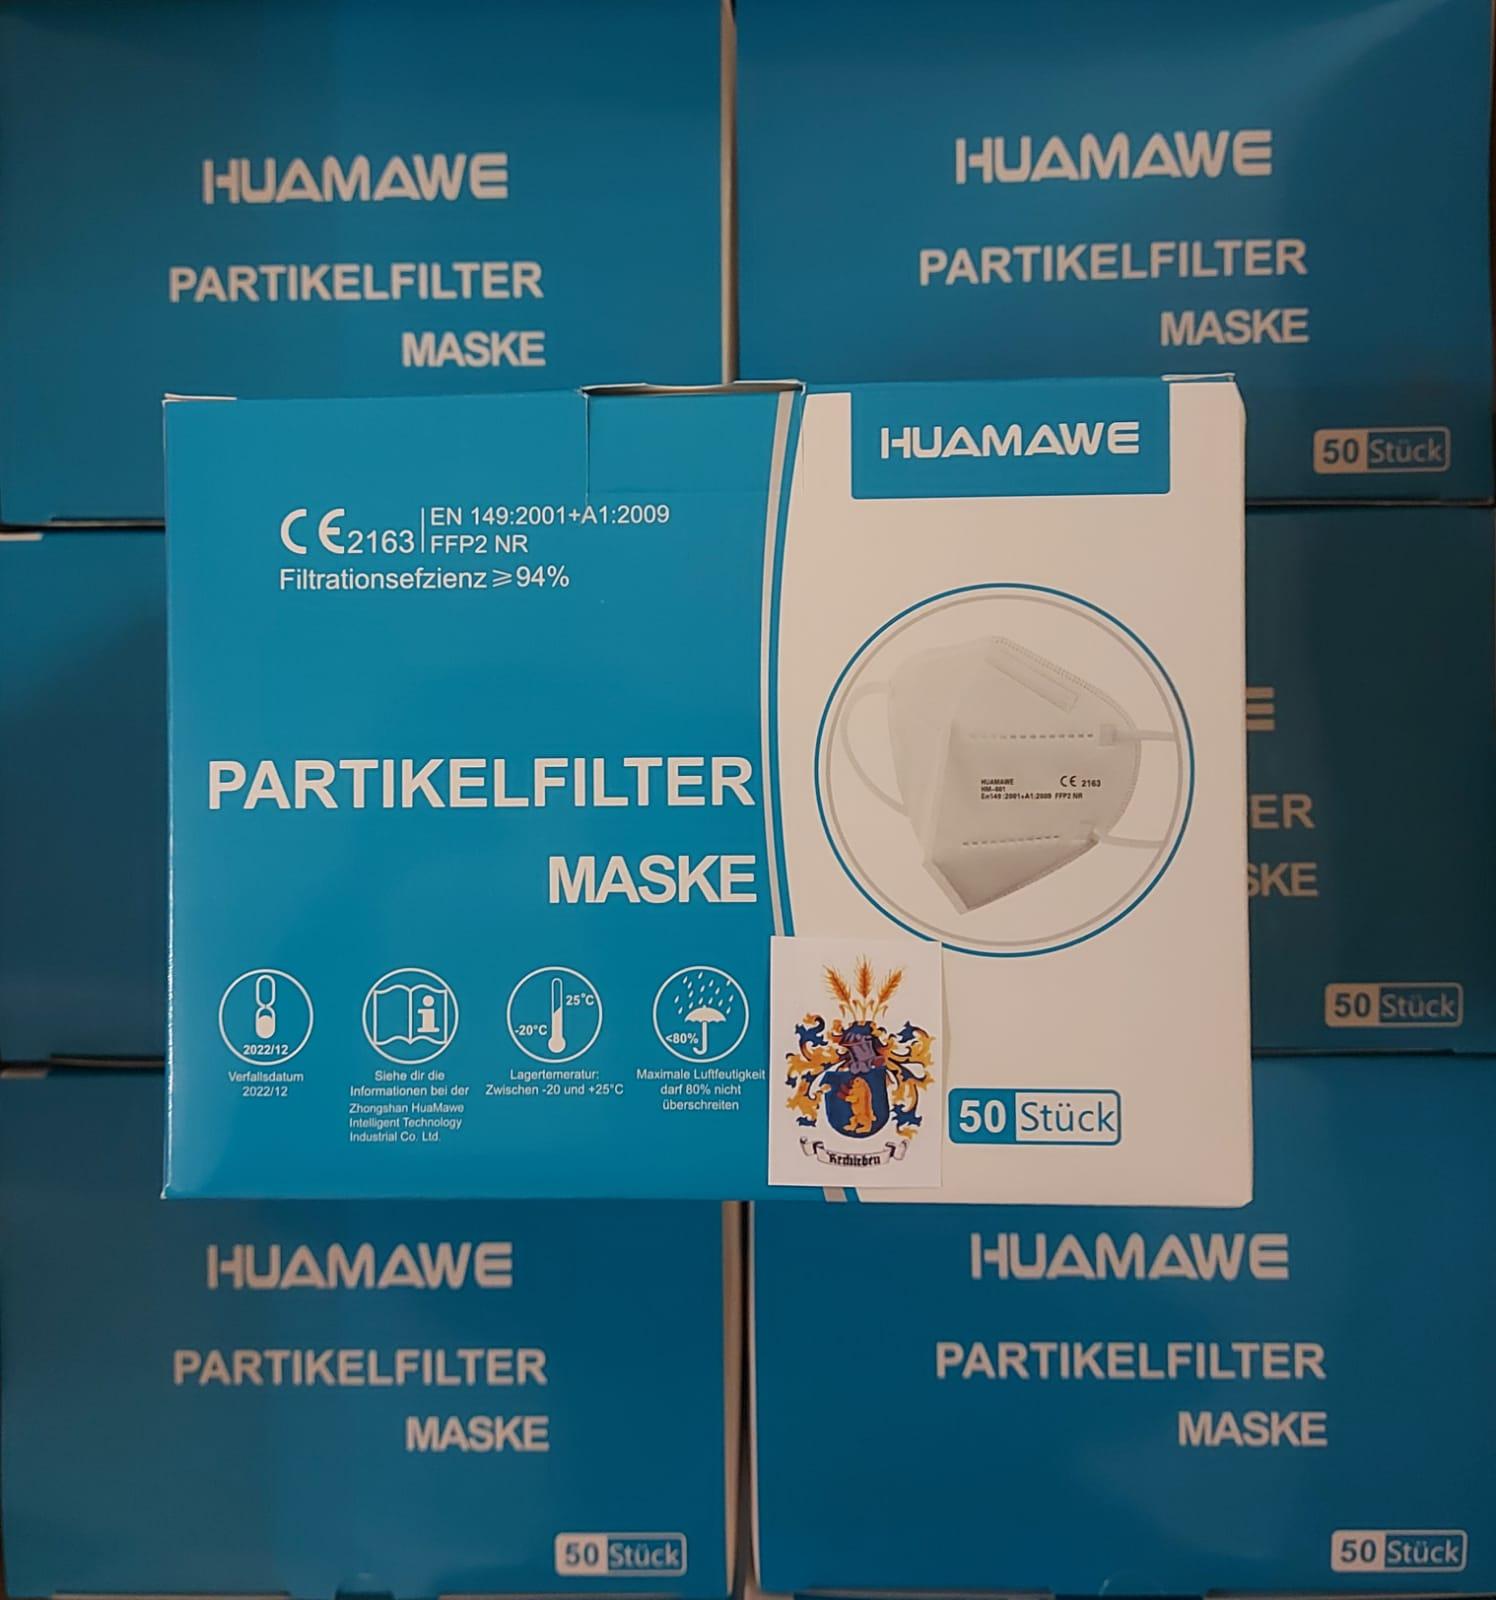 HUAMAWE HM-001 FFP2 Maske – CE 2163